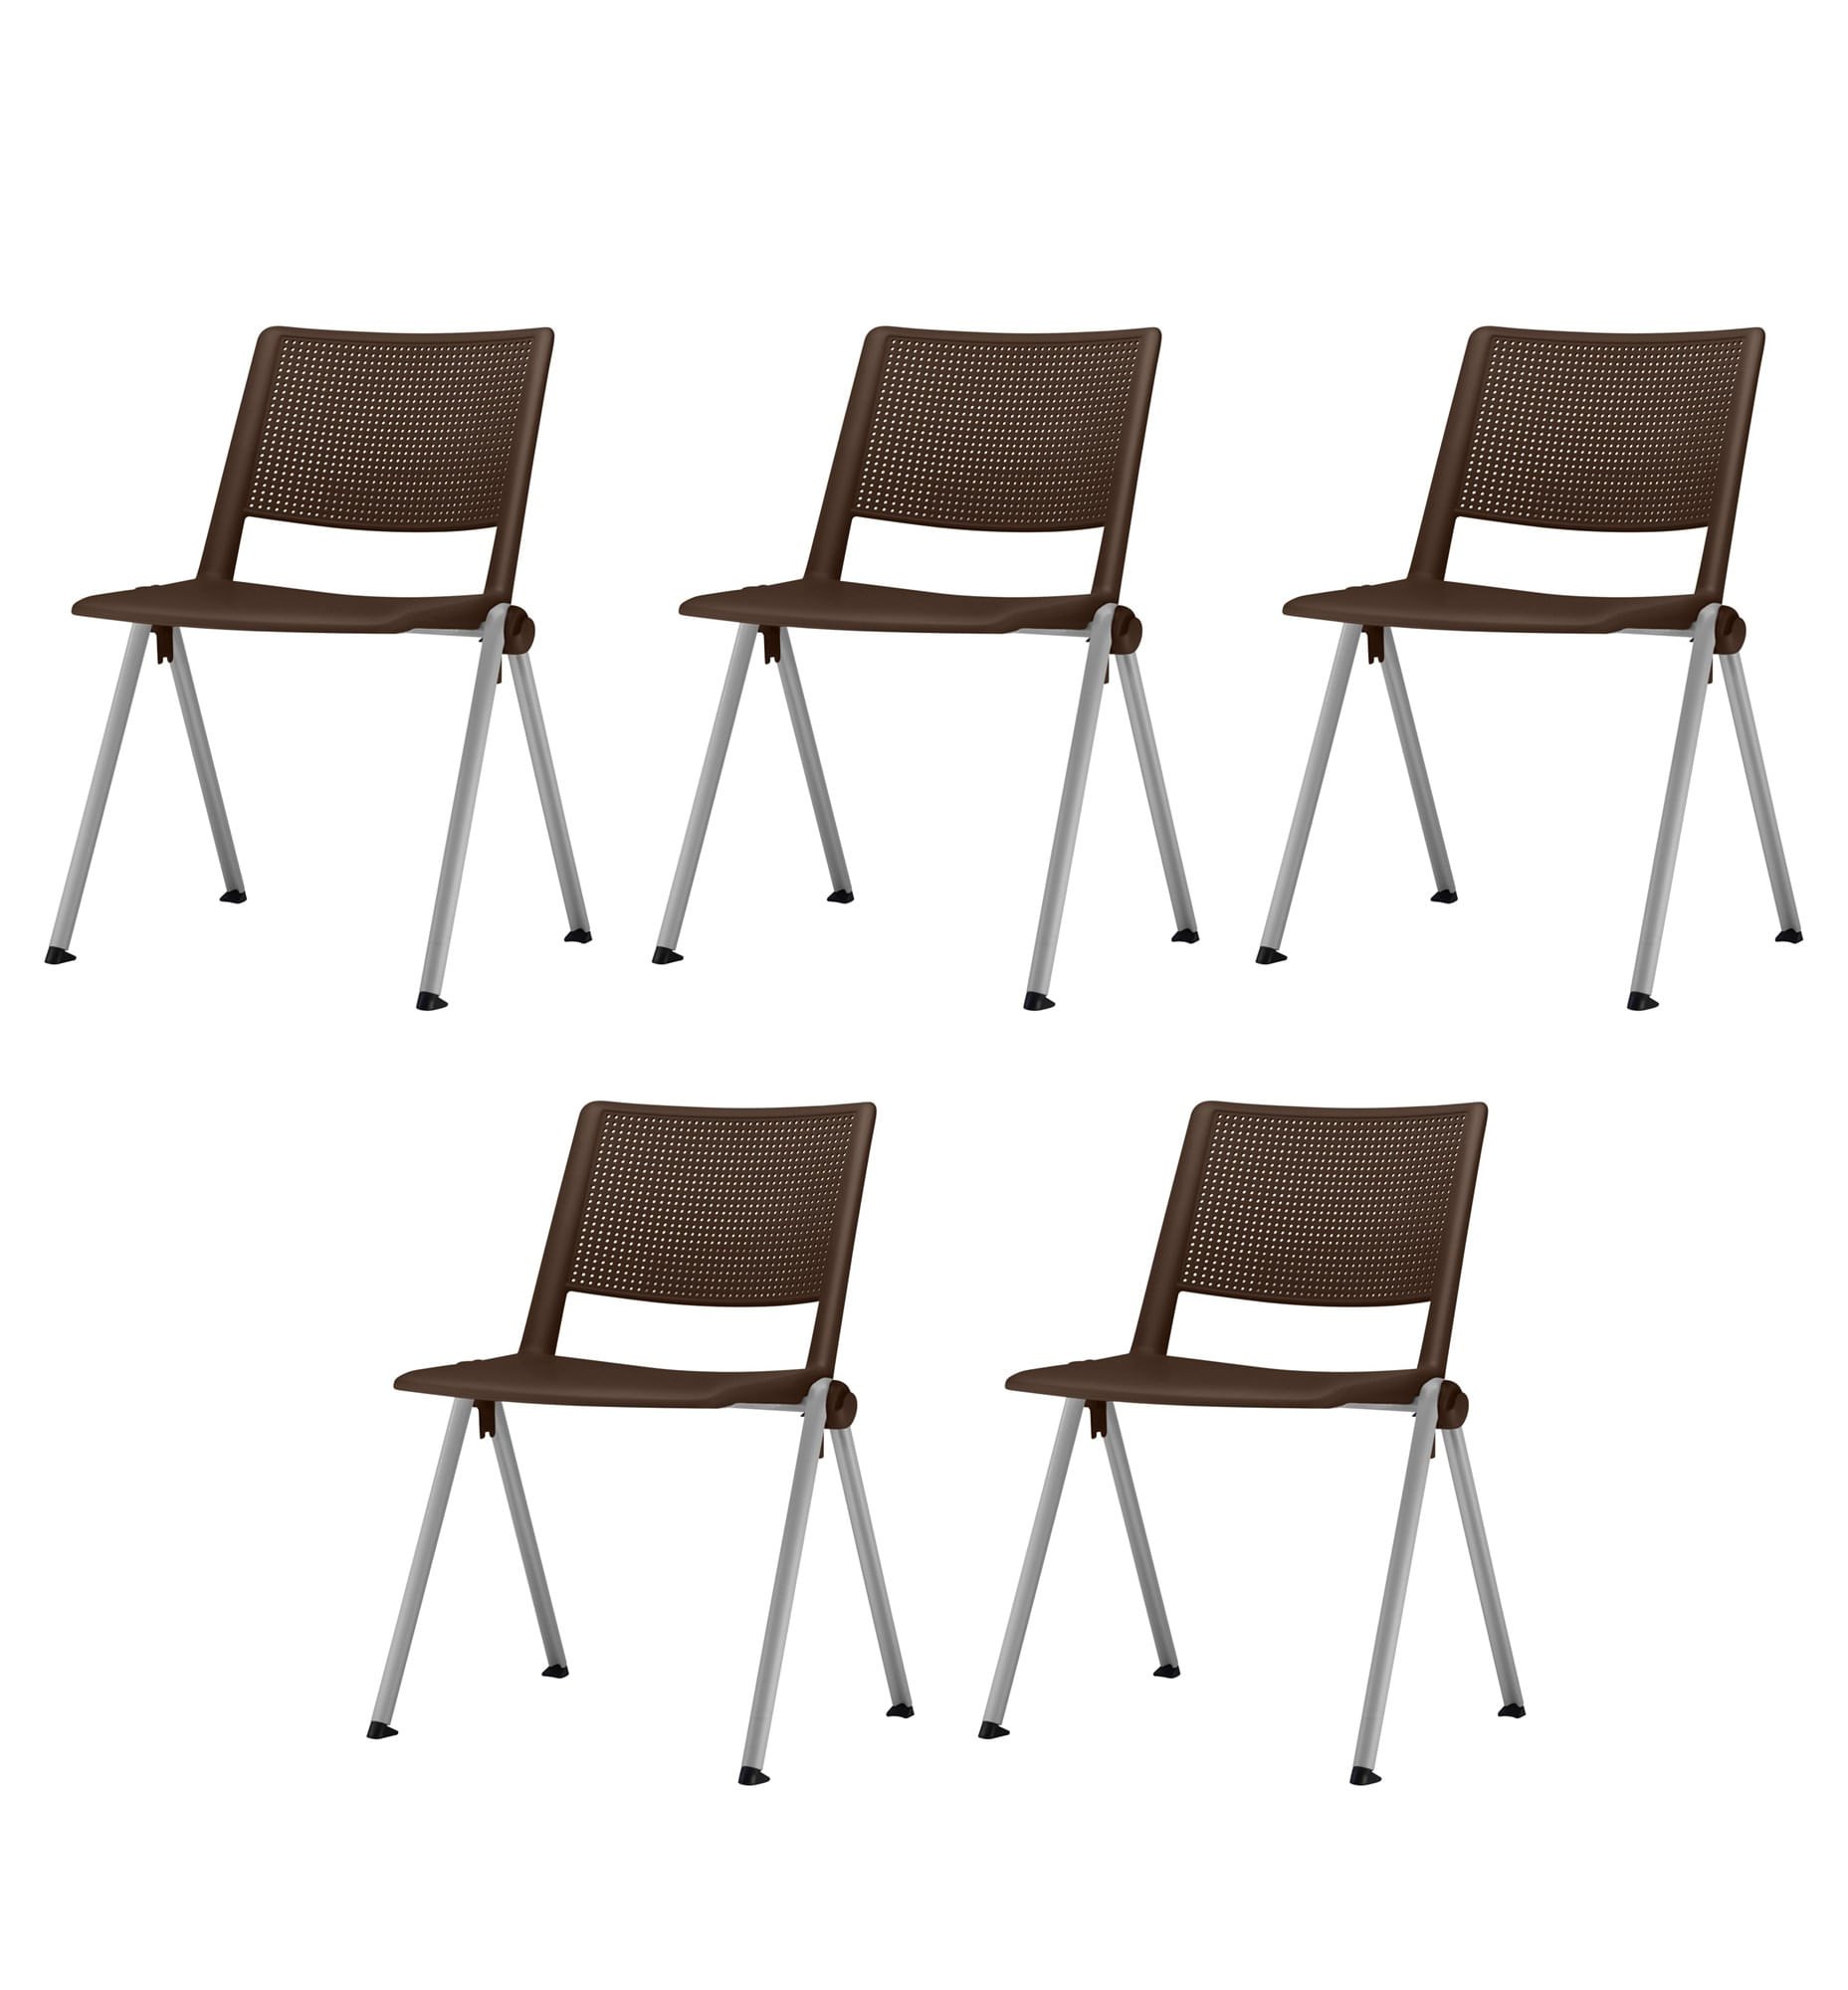 Kit 5 Cadeiras Up Assento Marrom Base Fixa Cinza - 57826